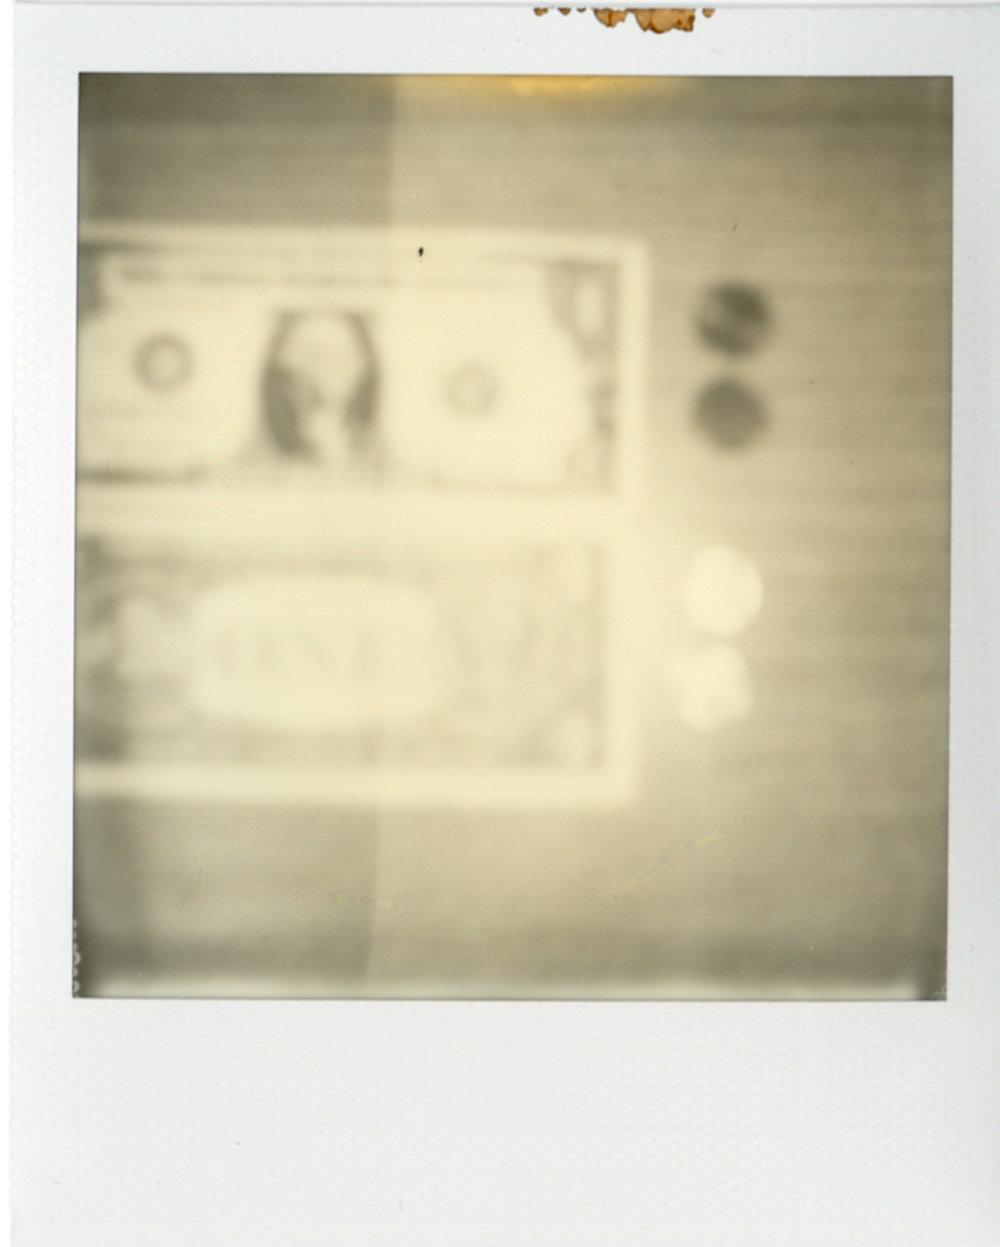 Polaroid052.jpg